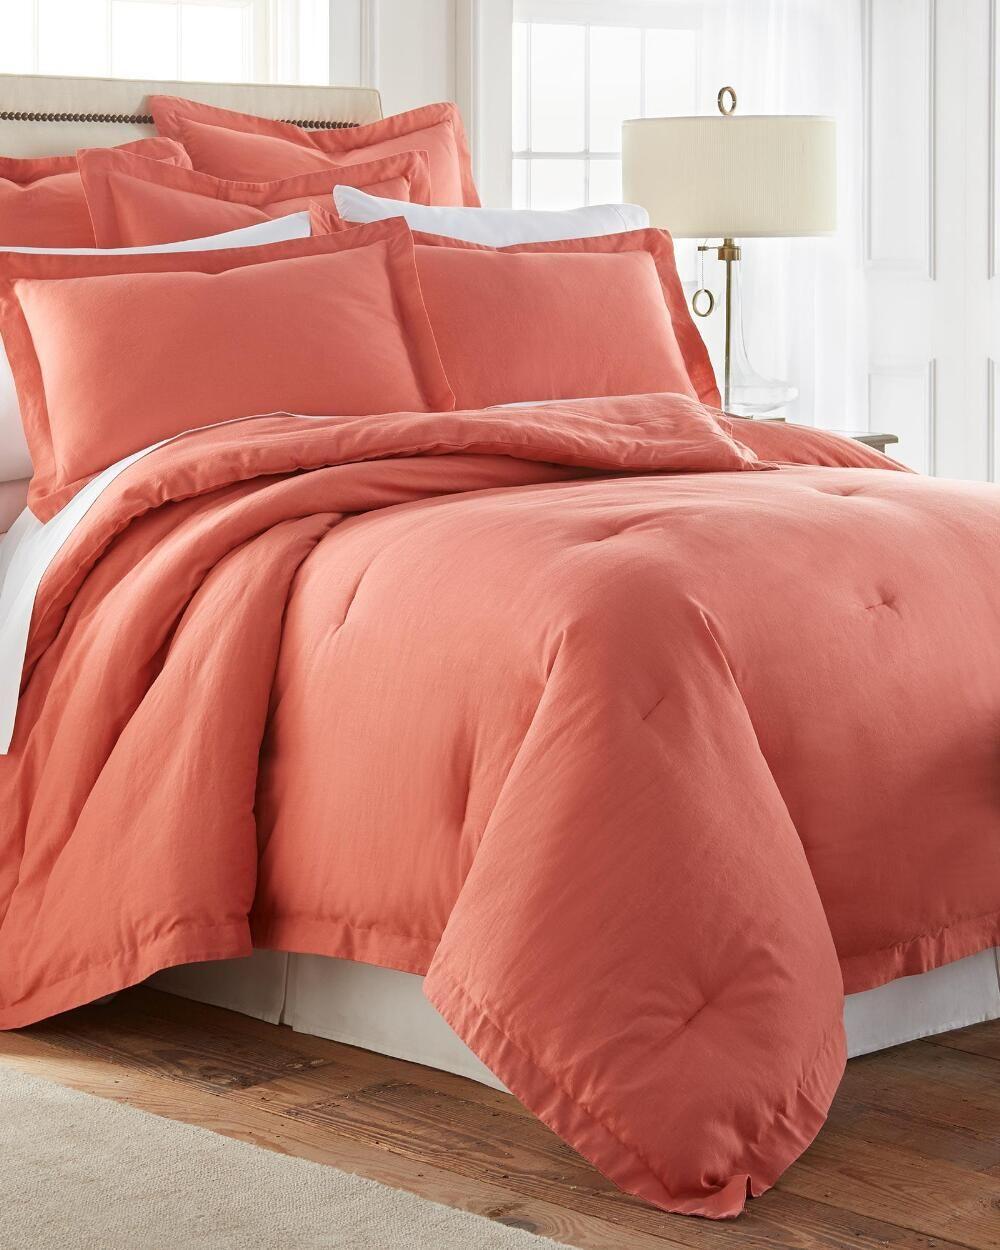 3 Piece Burnt Coral Linen Blend Comforter Set Comforters Bedding Bed Bath Stein Mart Luxury Bedroom Design Comforter Sets Luxurious Bedrooms